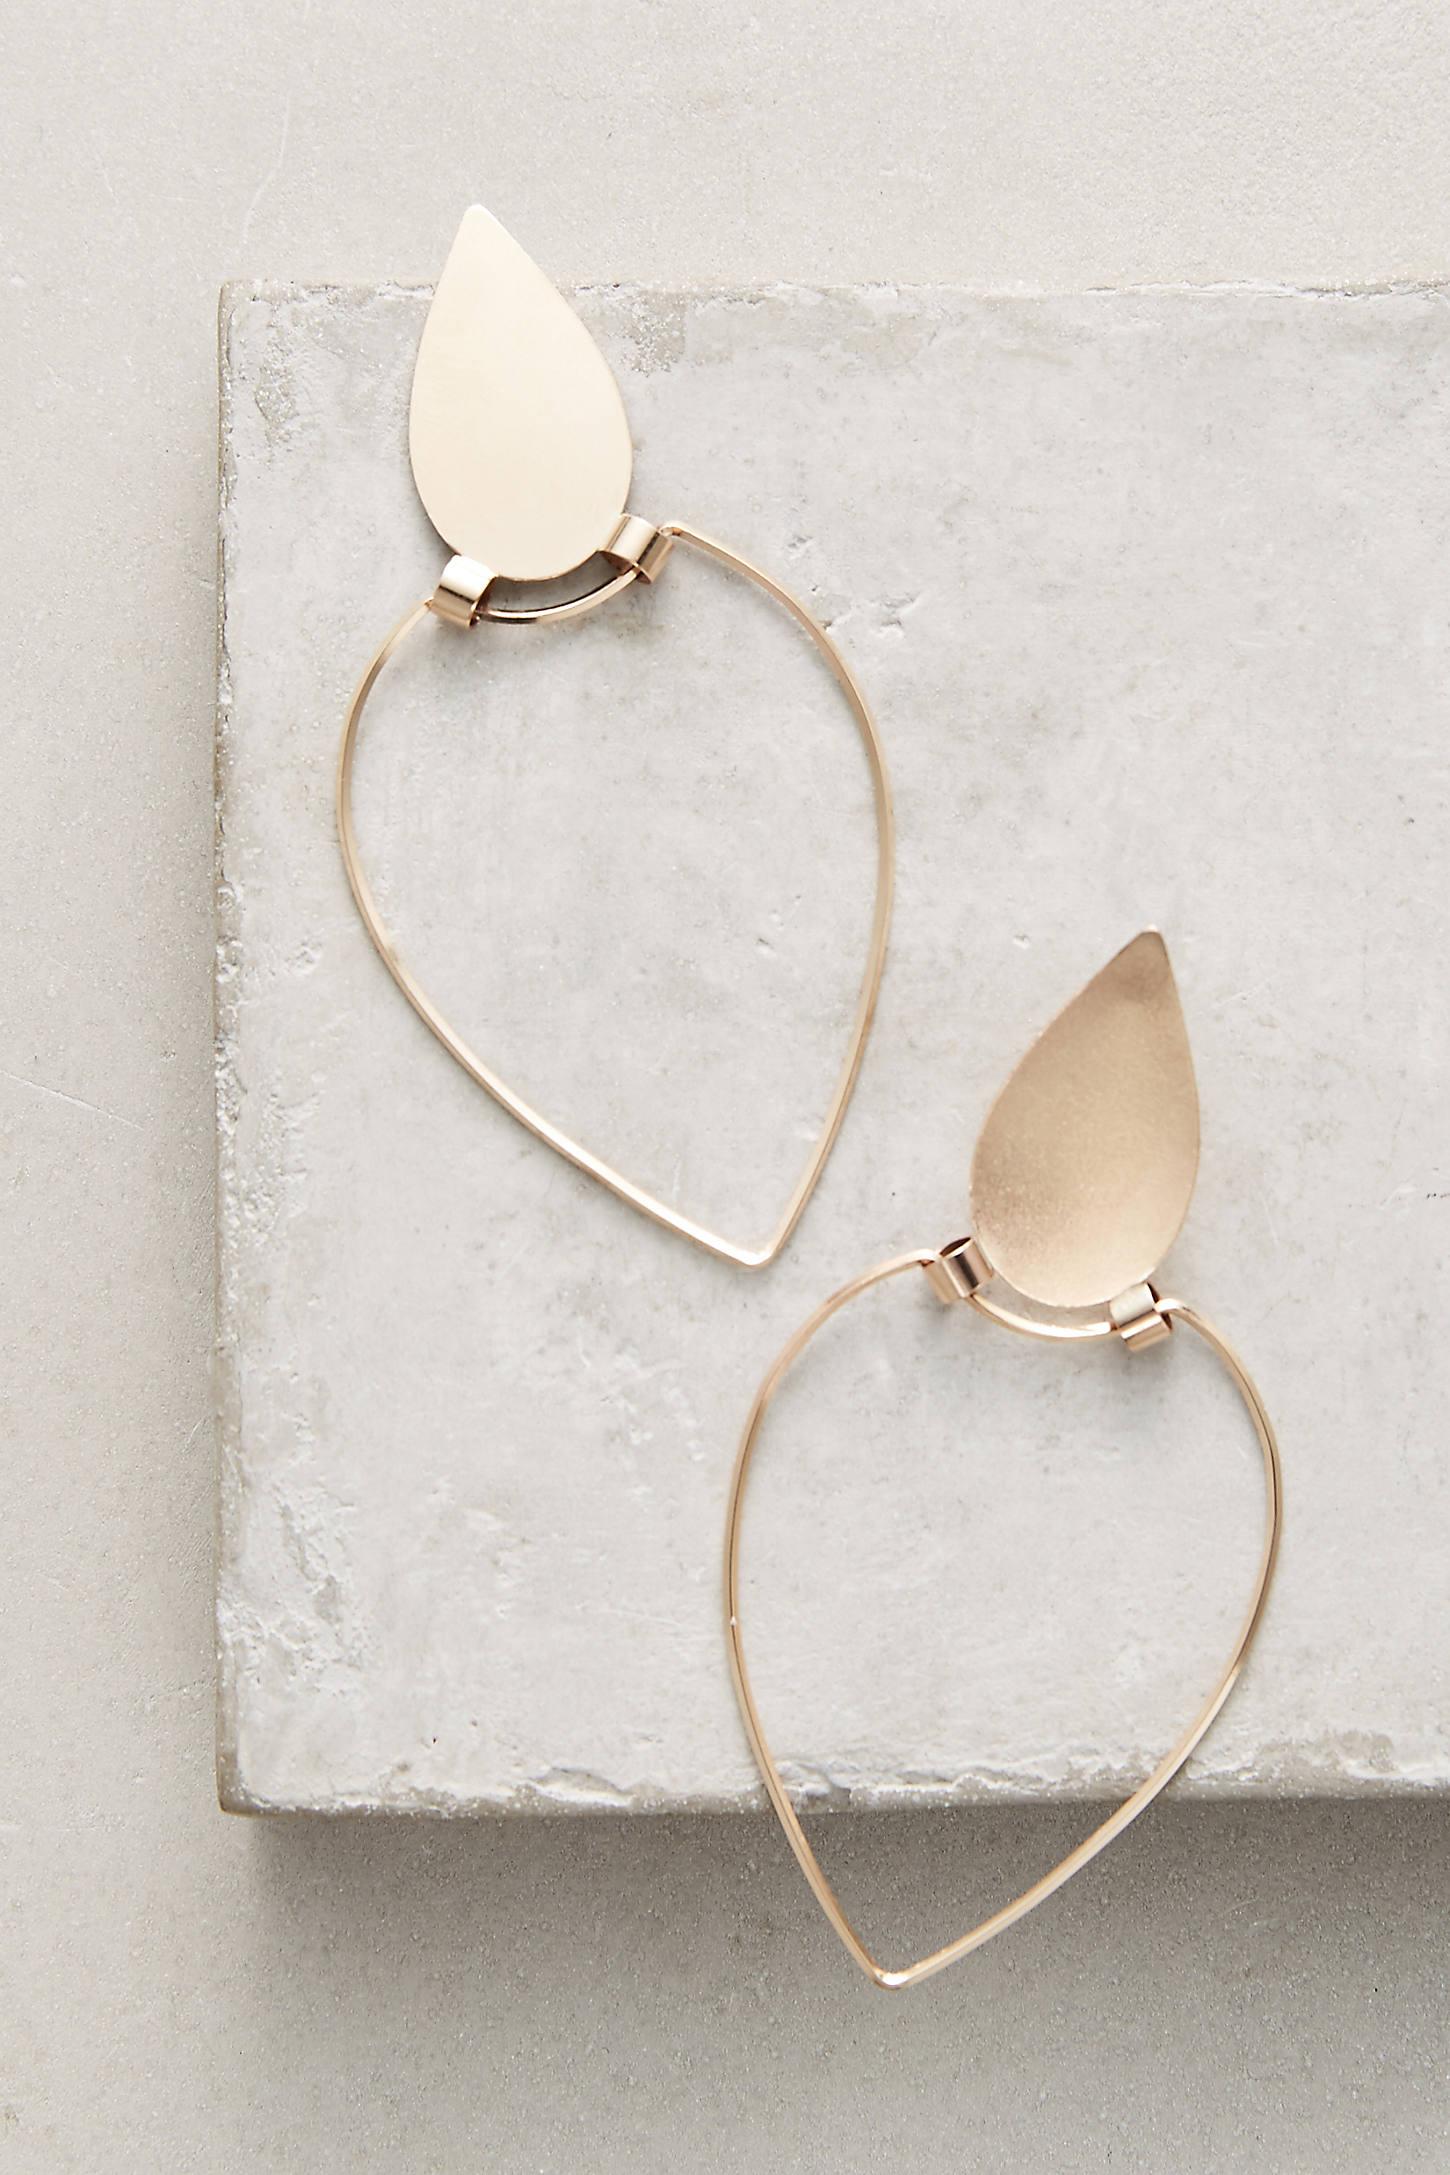 Inverted Teardrop Earrings